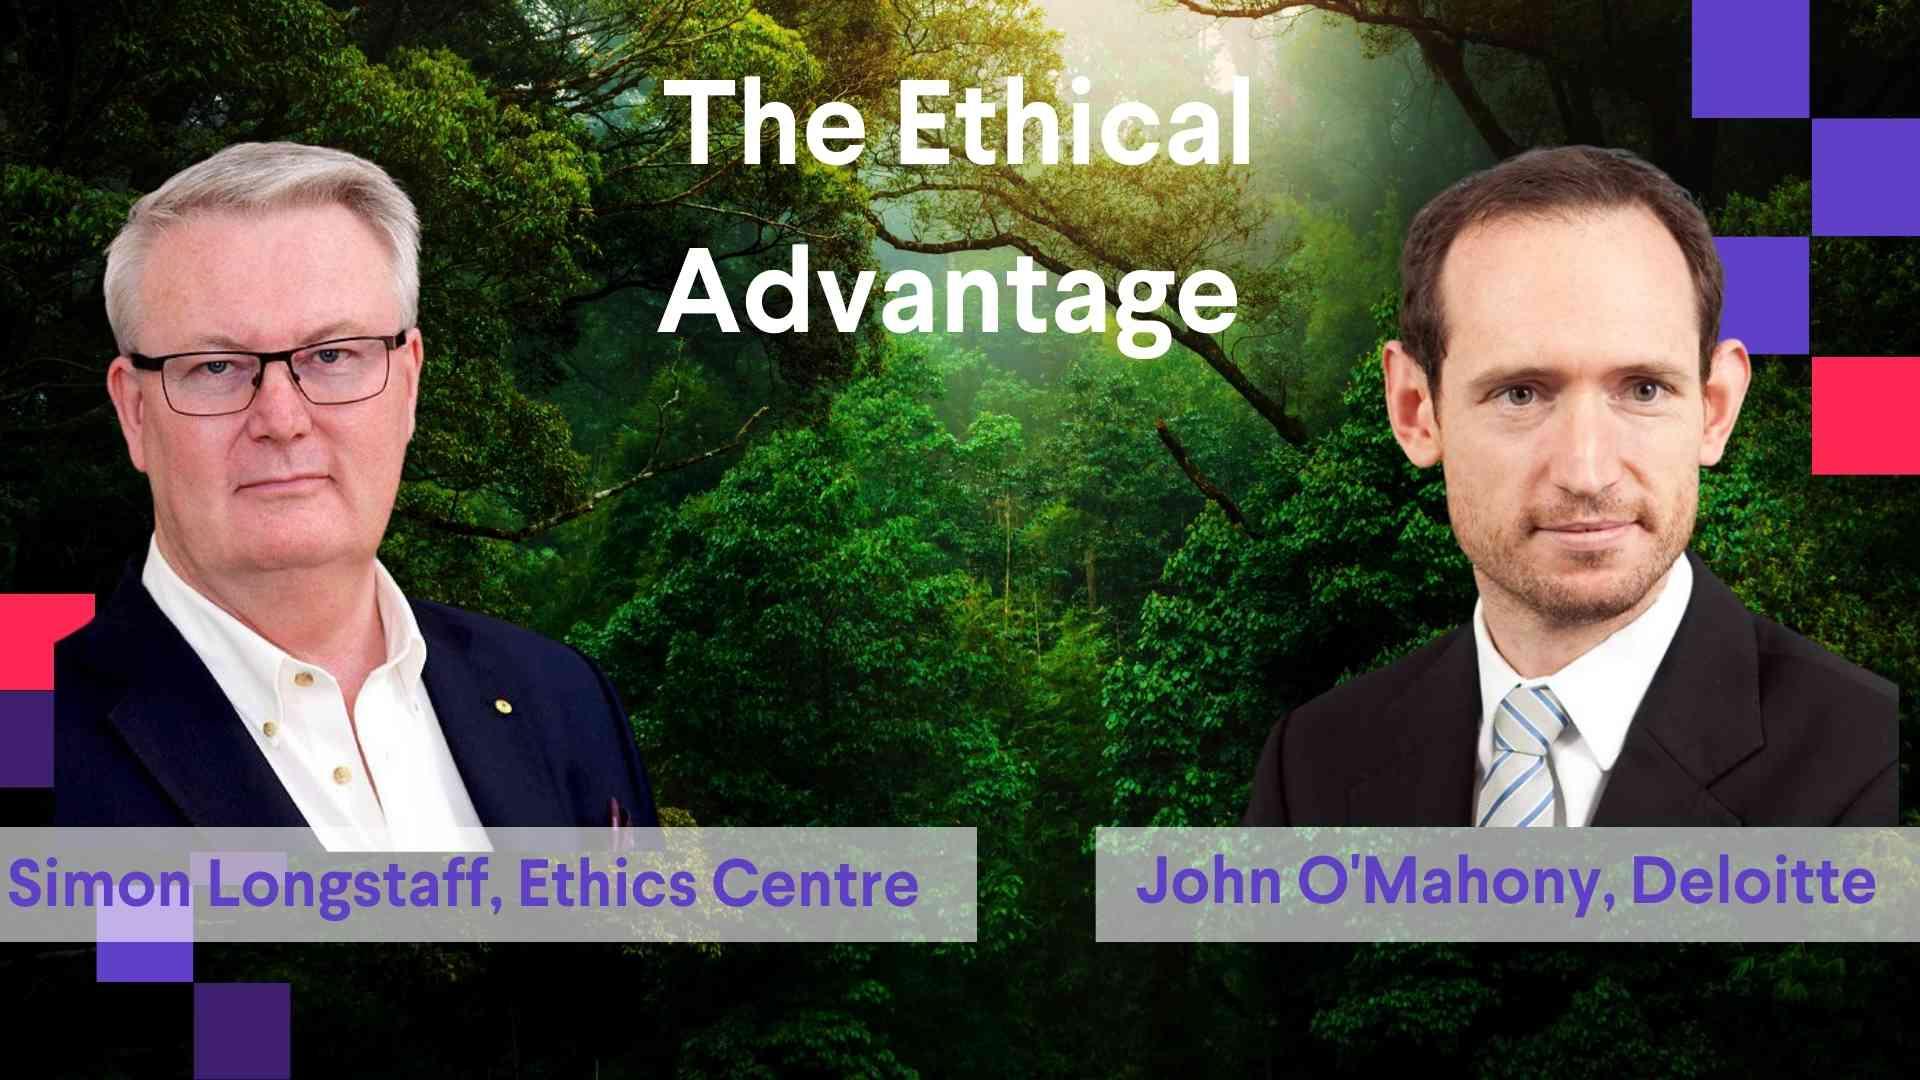 The economic case for ethics